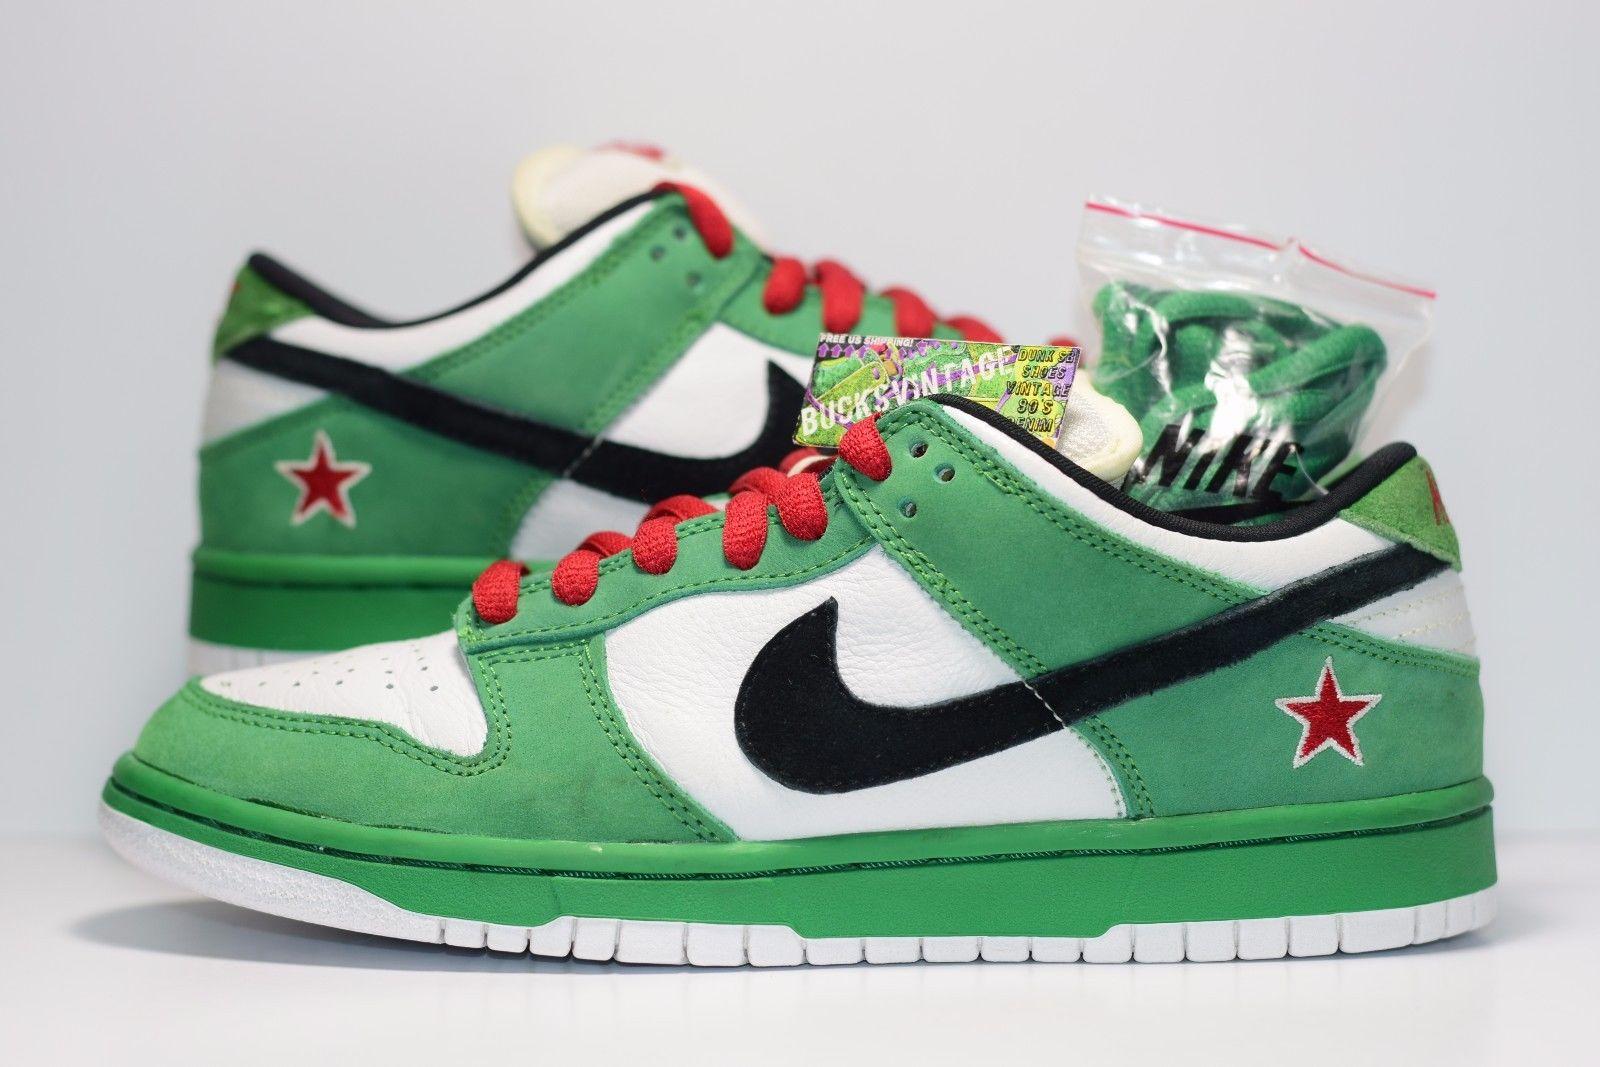 online store 1411c 46a42 Size 8 | 2003 Nike Dunk SB Low Heineken Premium Authentic Rare 304292-302  sold by BucksVintage